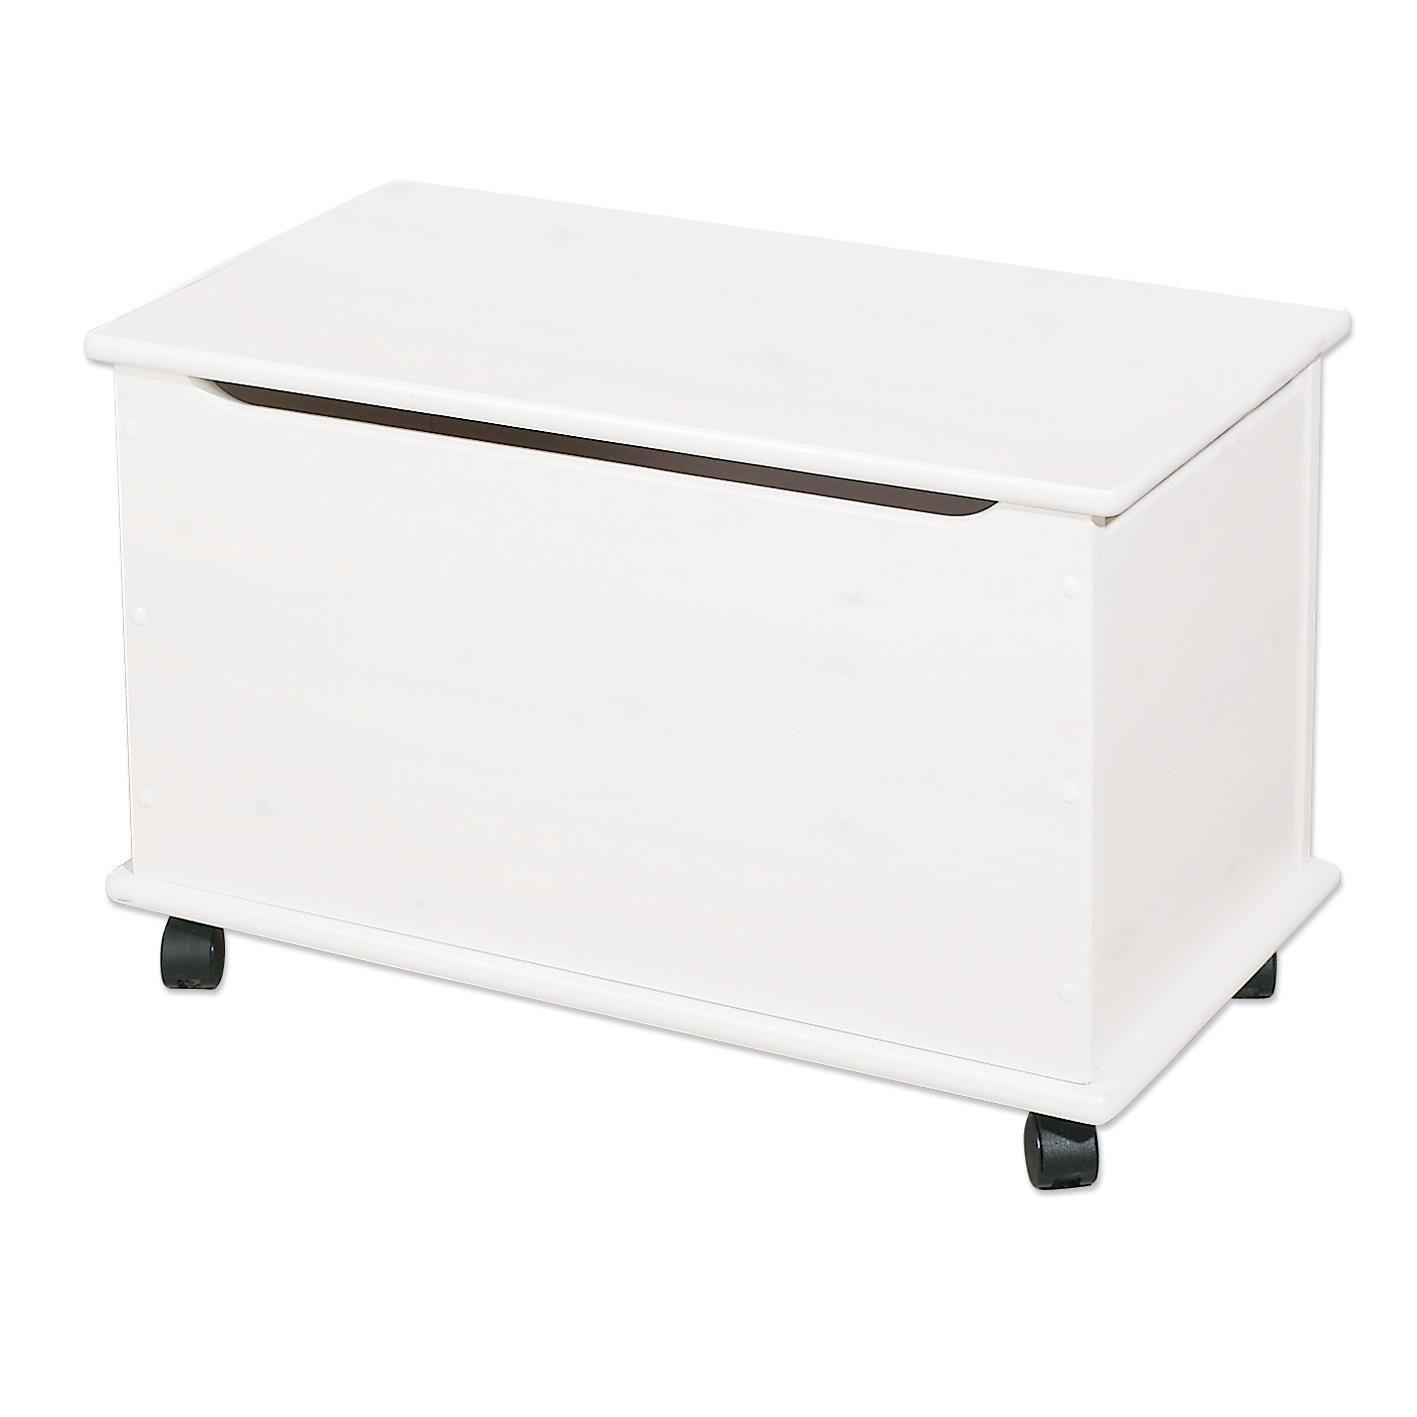 White Playchest On Wheels By Hoppekids Toy Storage Bench